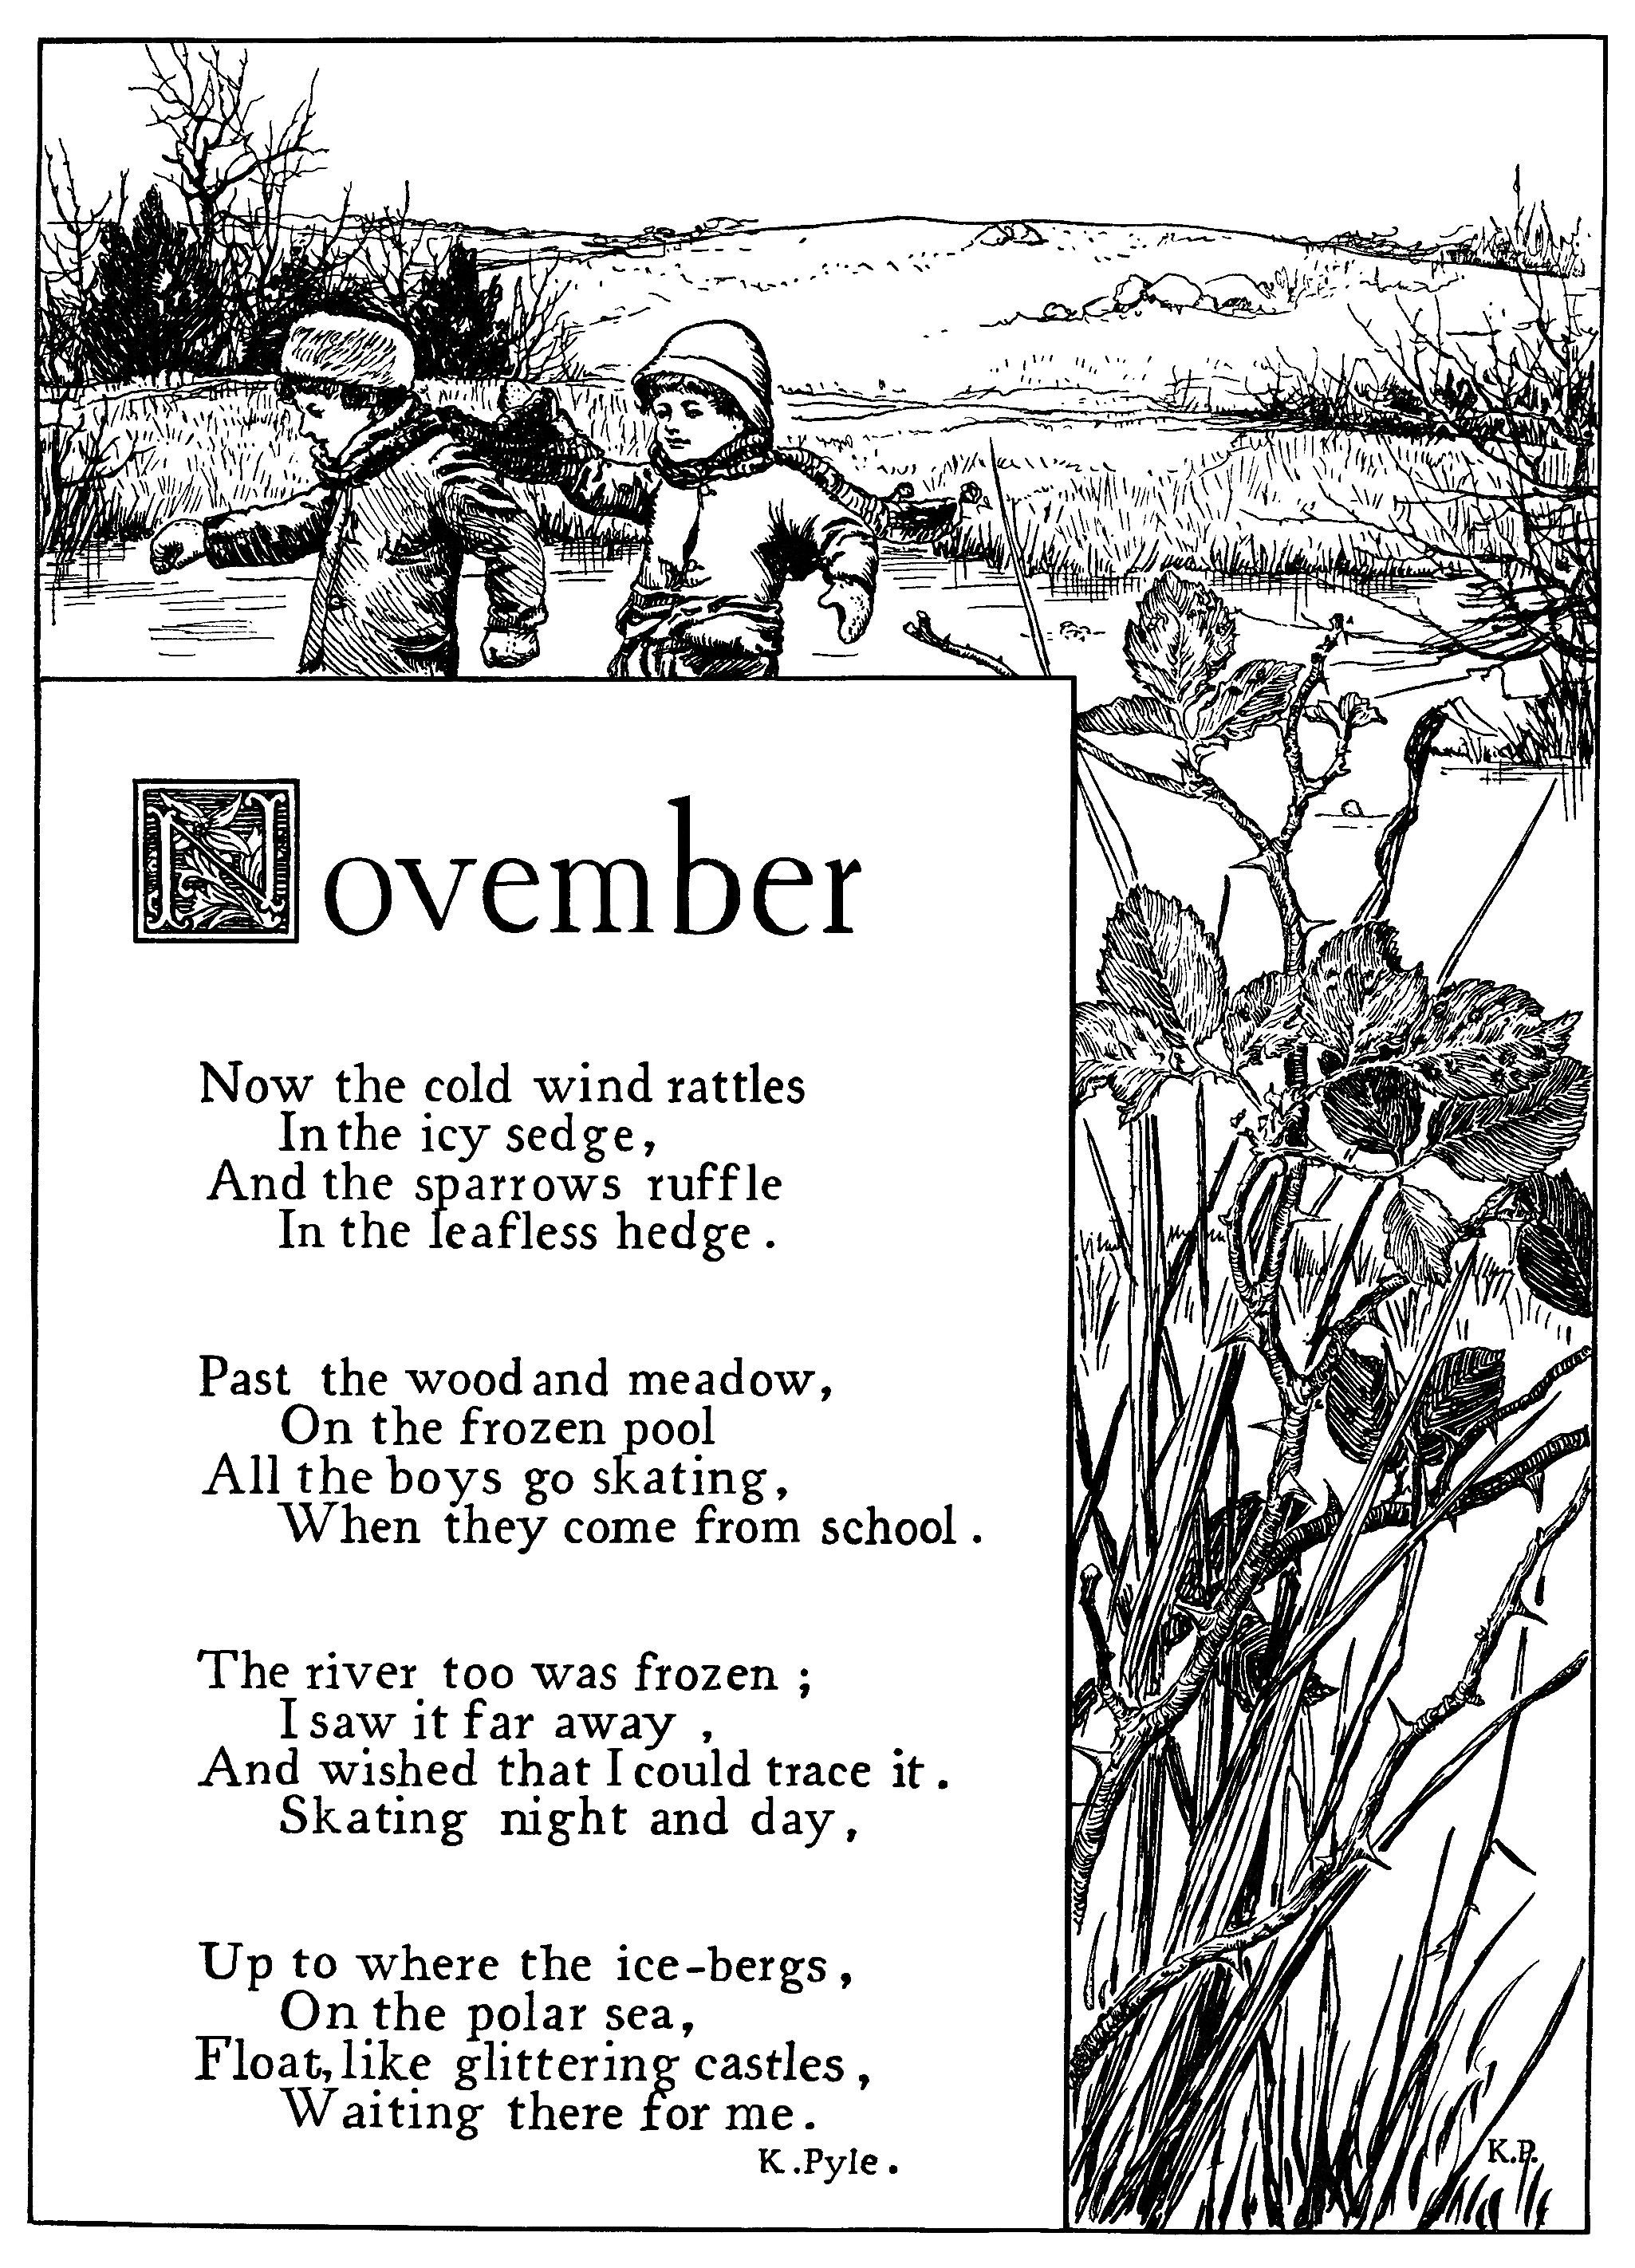 November Poem By K Pyle